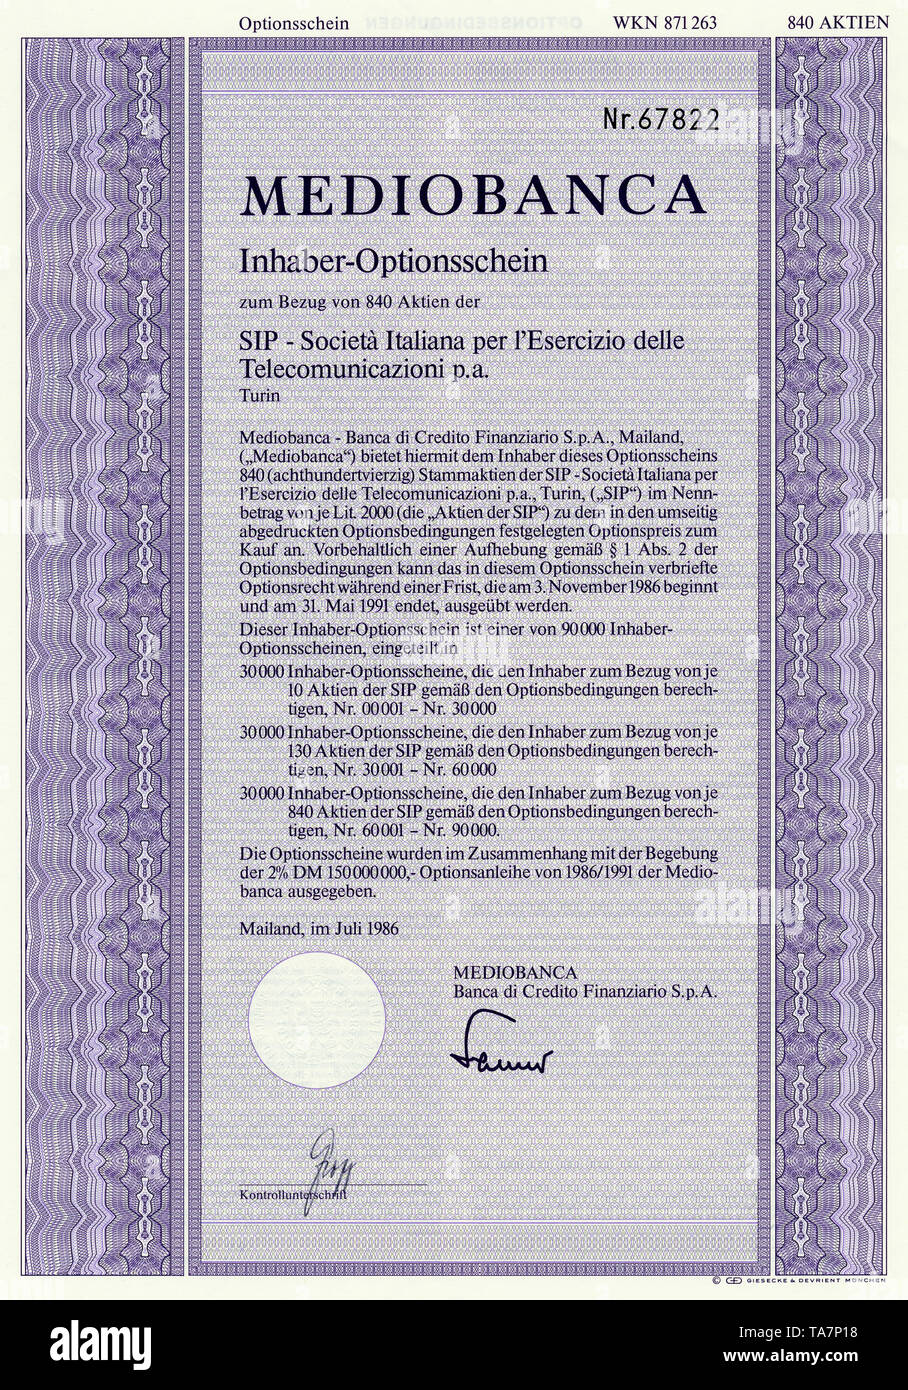 Historic stock certificate, Securities certificate, bearer warrant, Historisches Wertpapier, Inhaber-Optionsschein, italienische Kreditinstitut,  Industriefinanzierung,  Mediobanca, 1986, Mailand, Italien, Europa - Stock Image